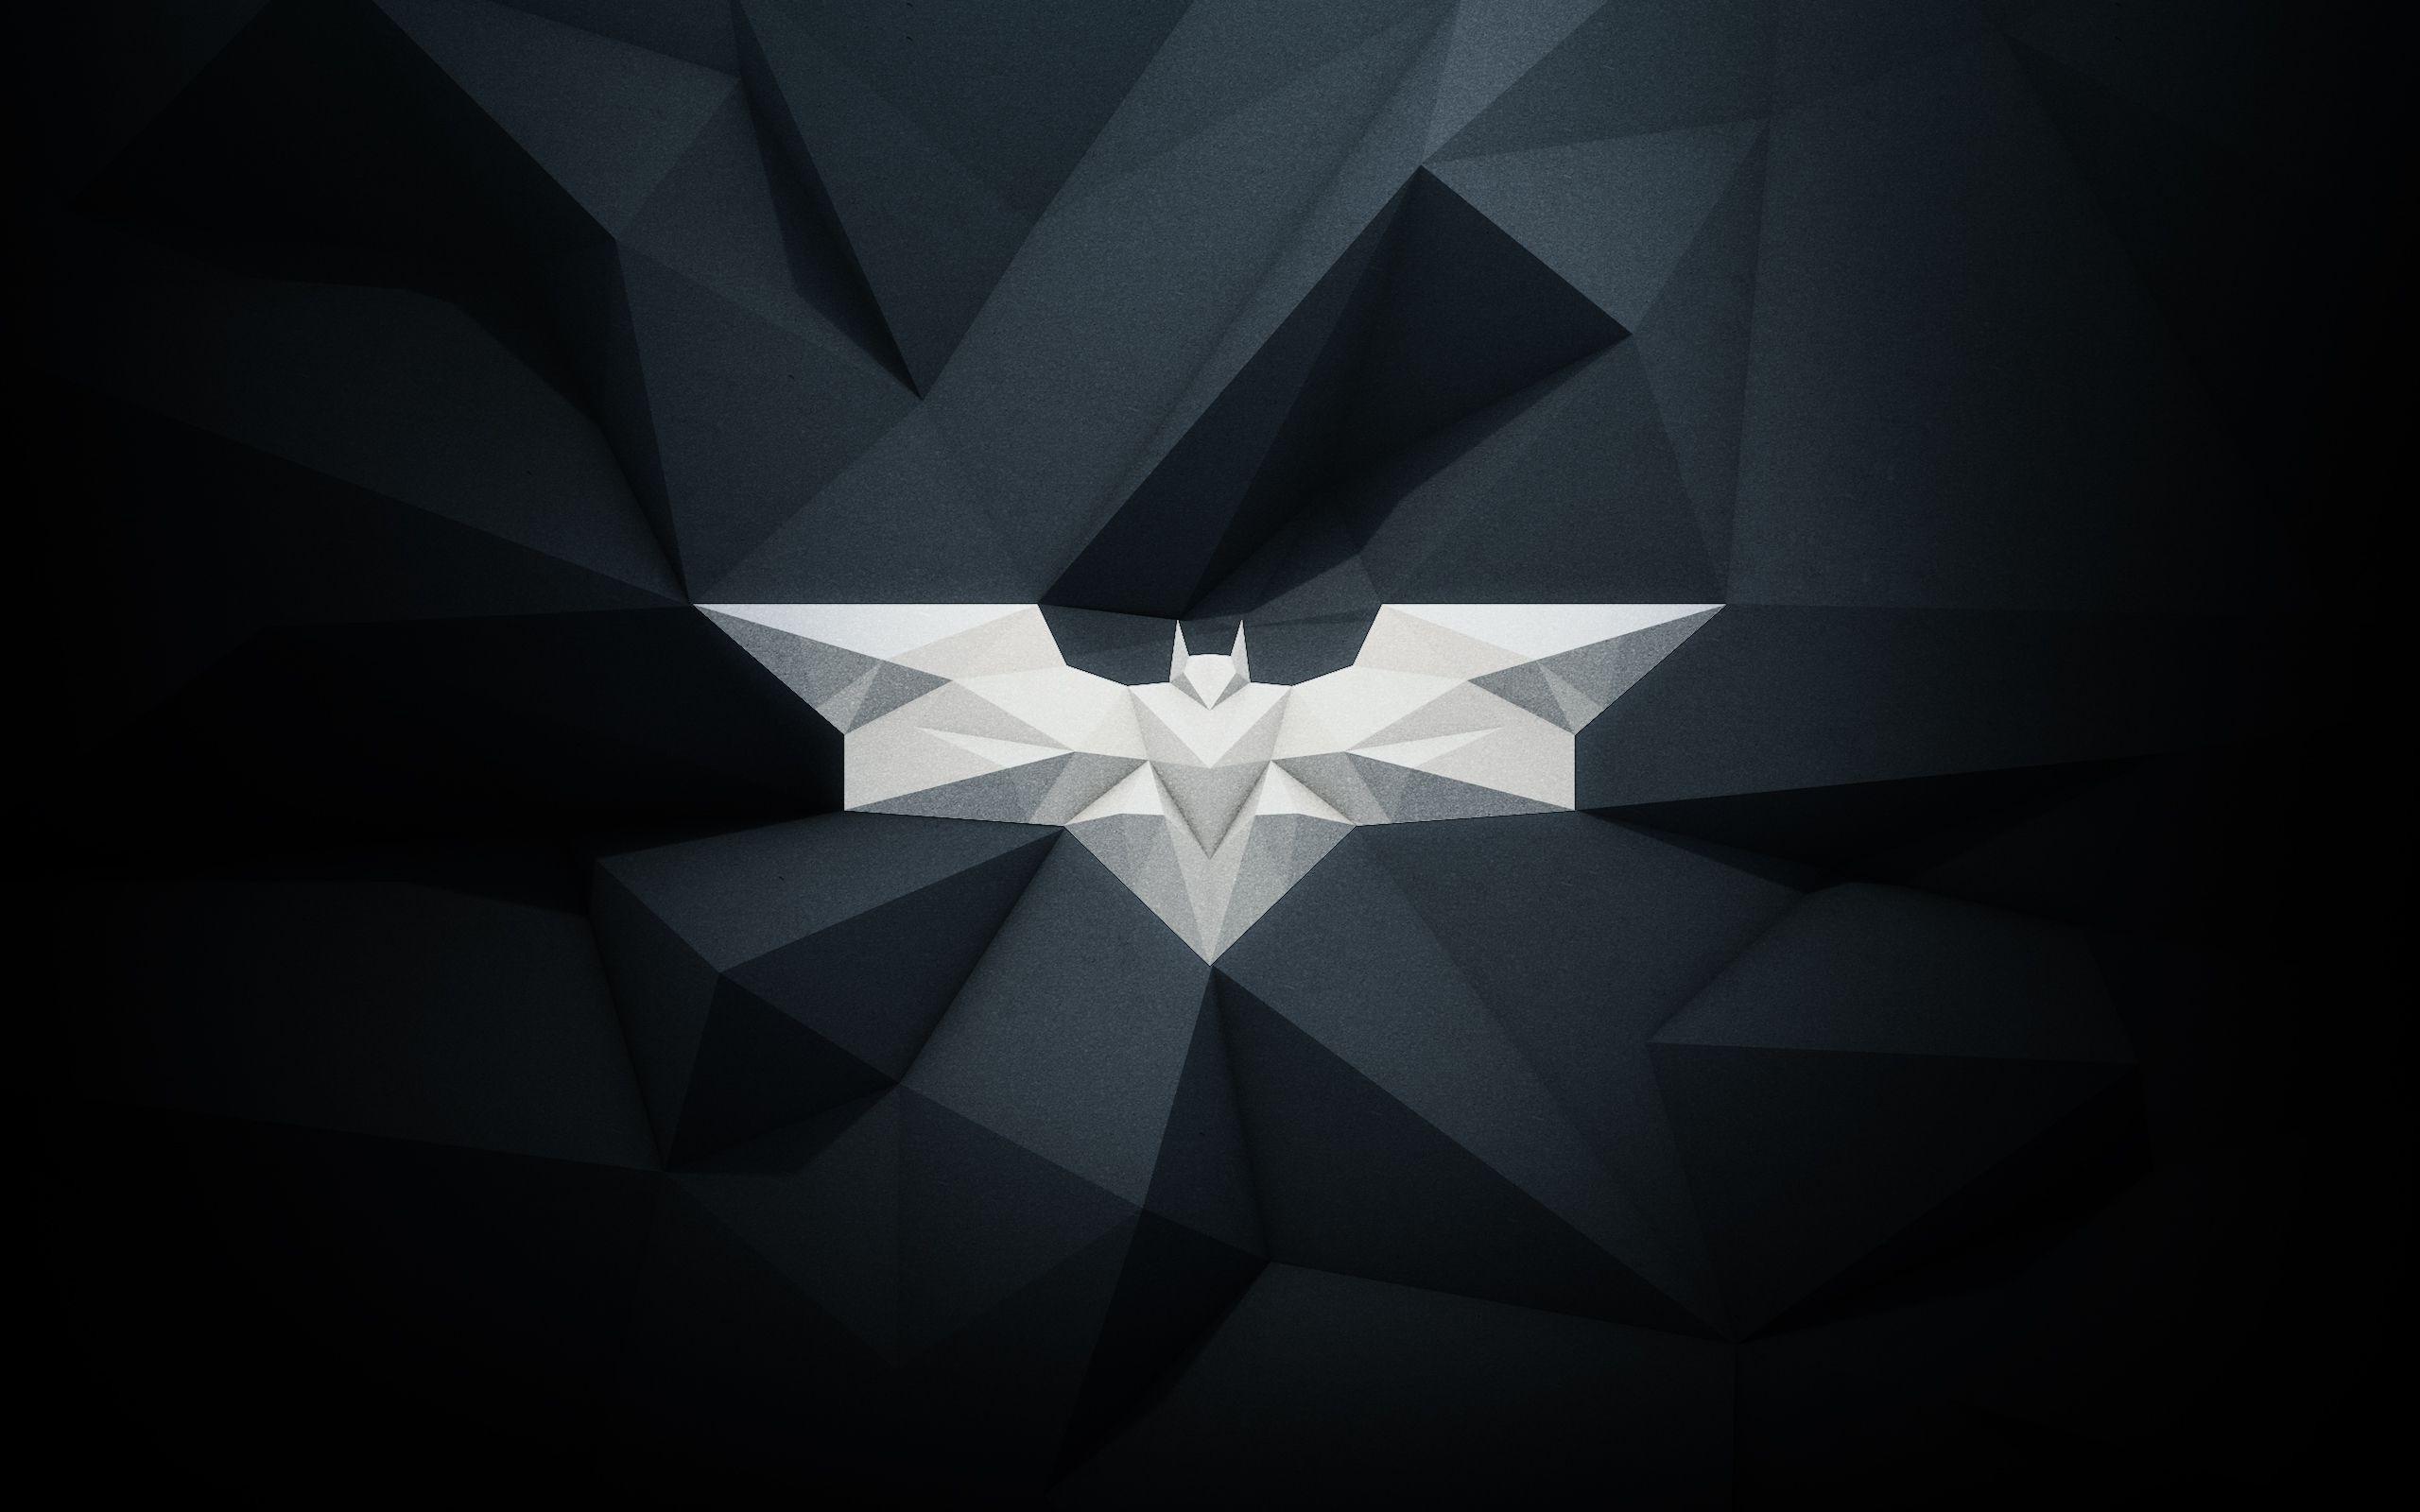 wallpaper.wiki-Photos-HD-Batman-Logo-Backgrounds-PIC-